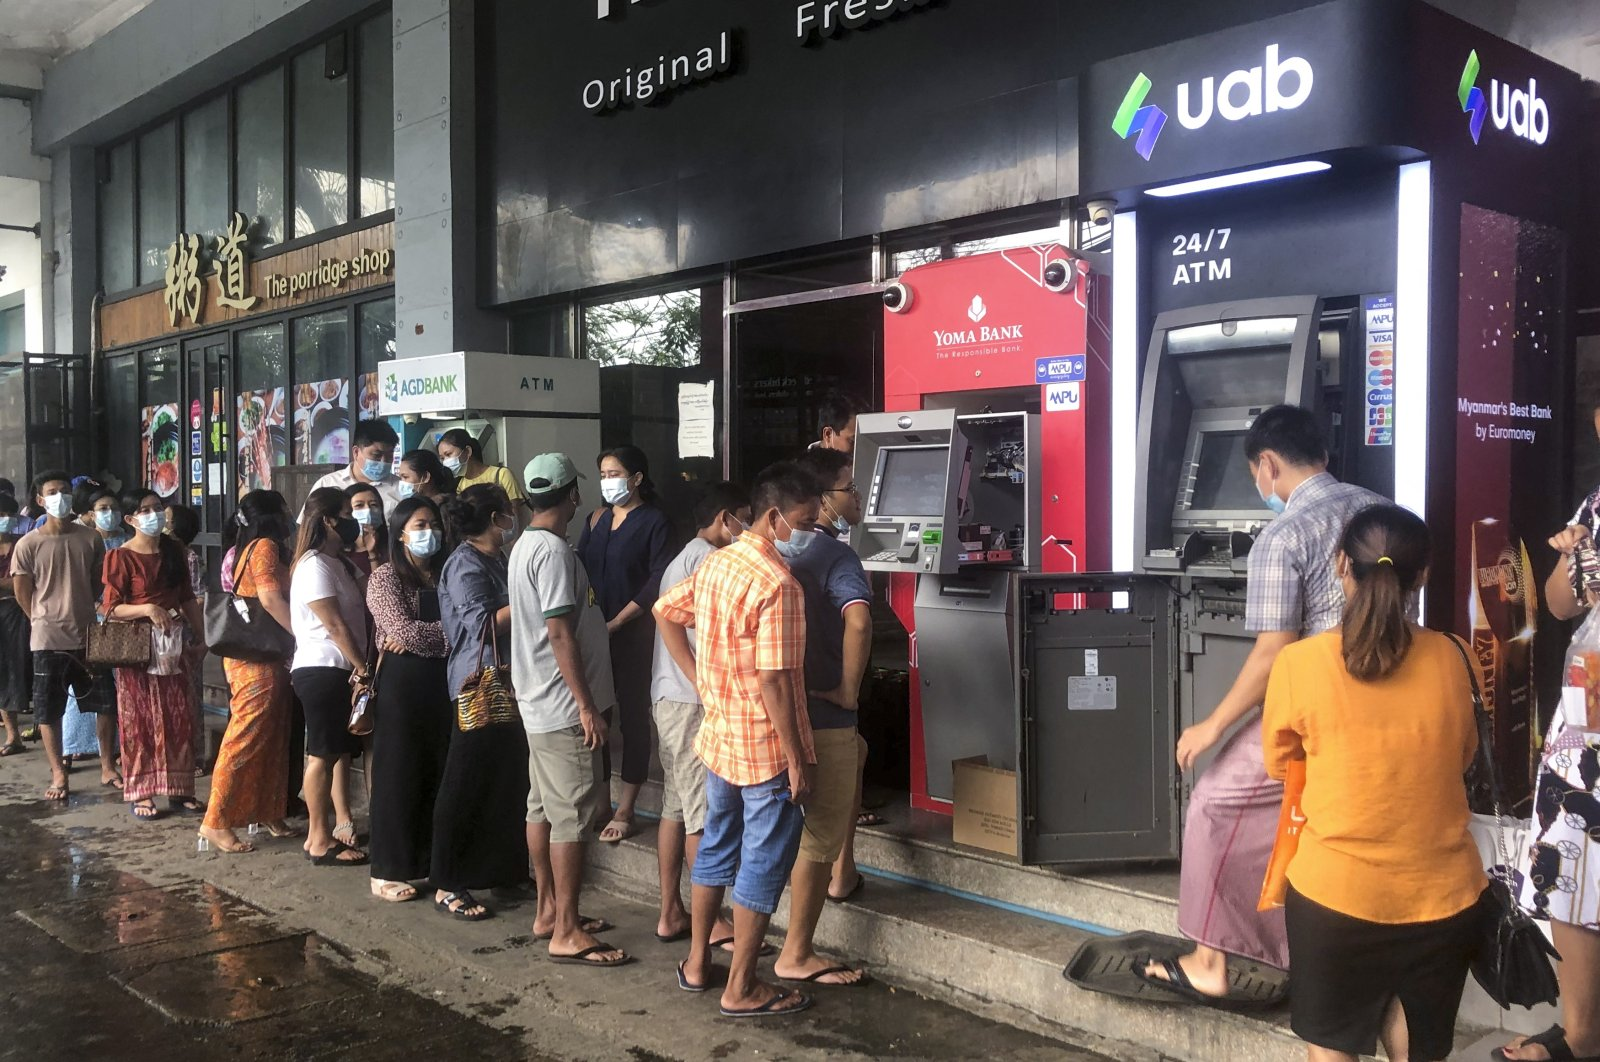 People wait near ATM machines to withdraw cash in Yangon, Myanmar, April 29, 2021. (EPA Photo)